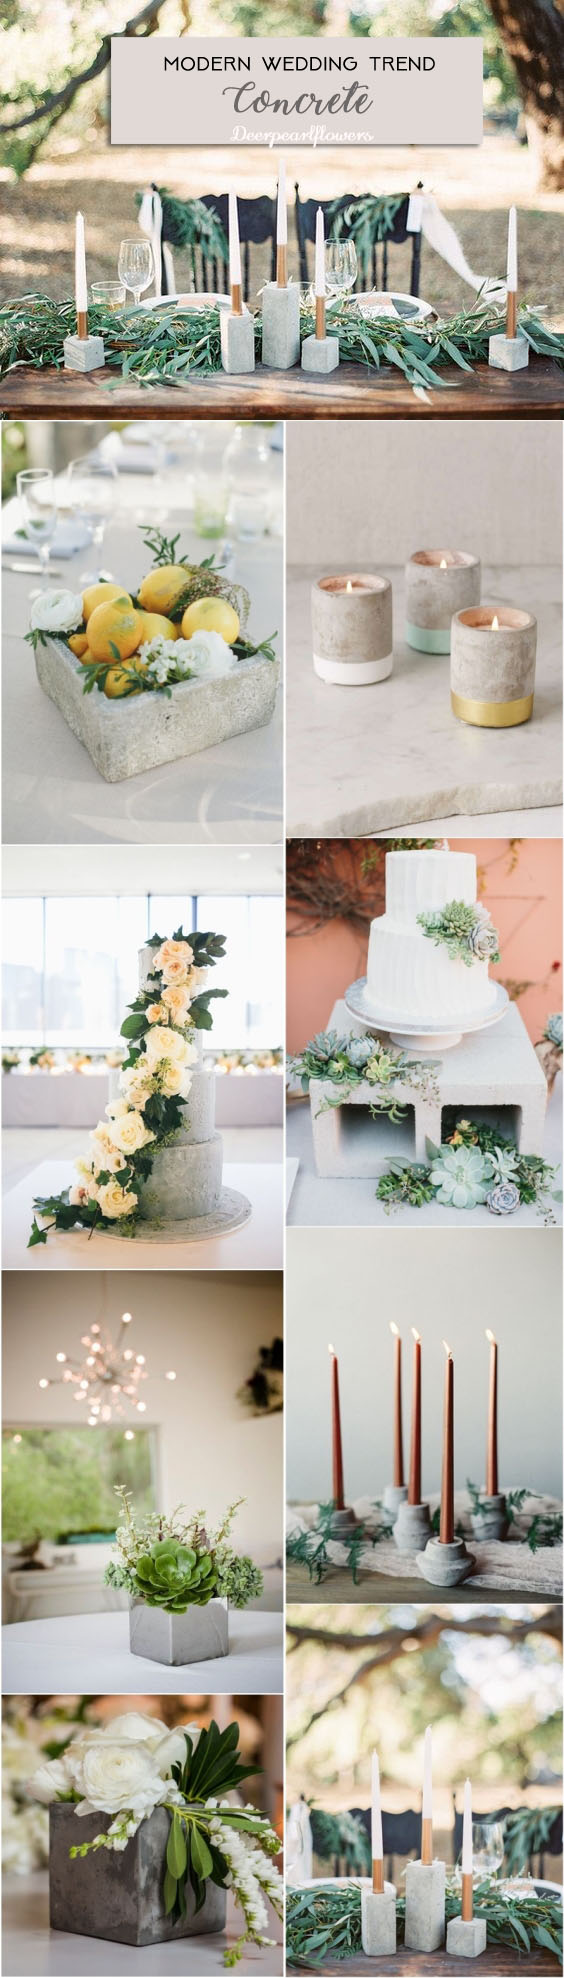 Top 8 Modern Wedding Theme Ideas for 2019 | Deer Pearl Flowers